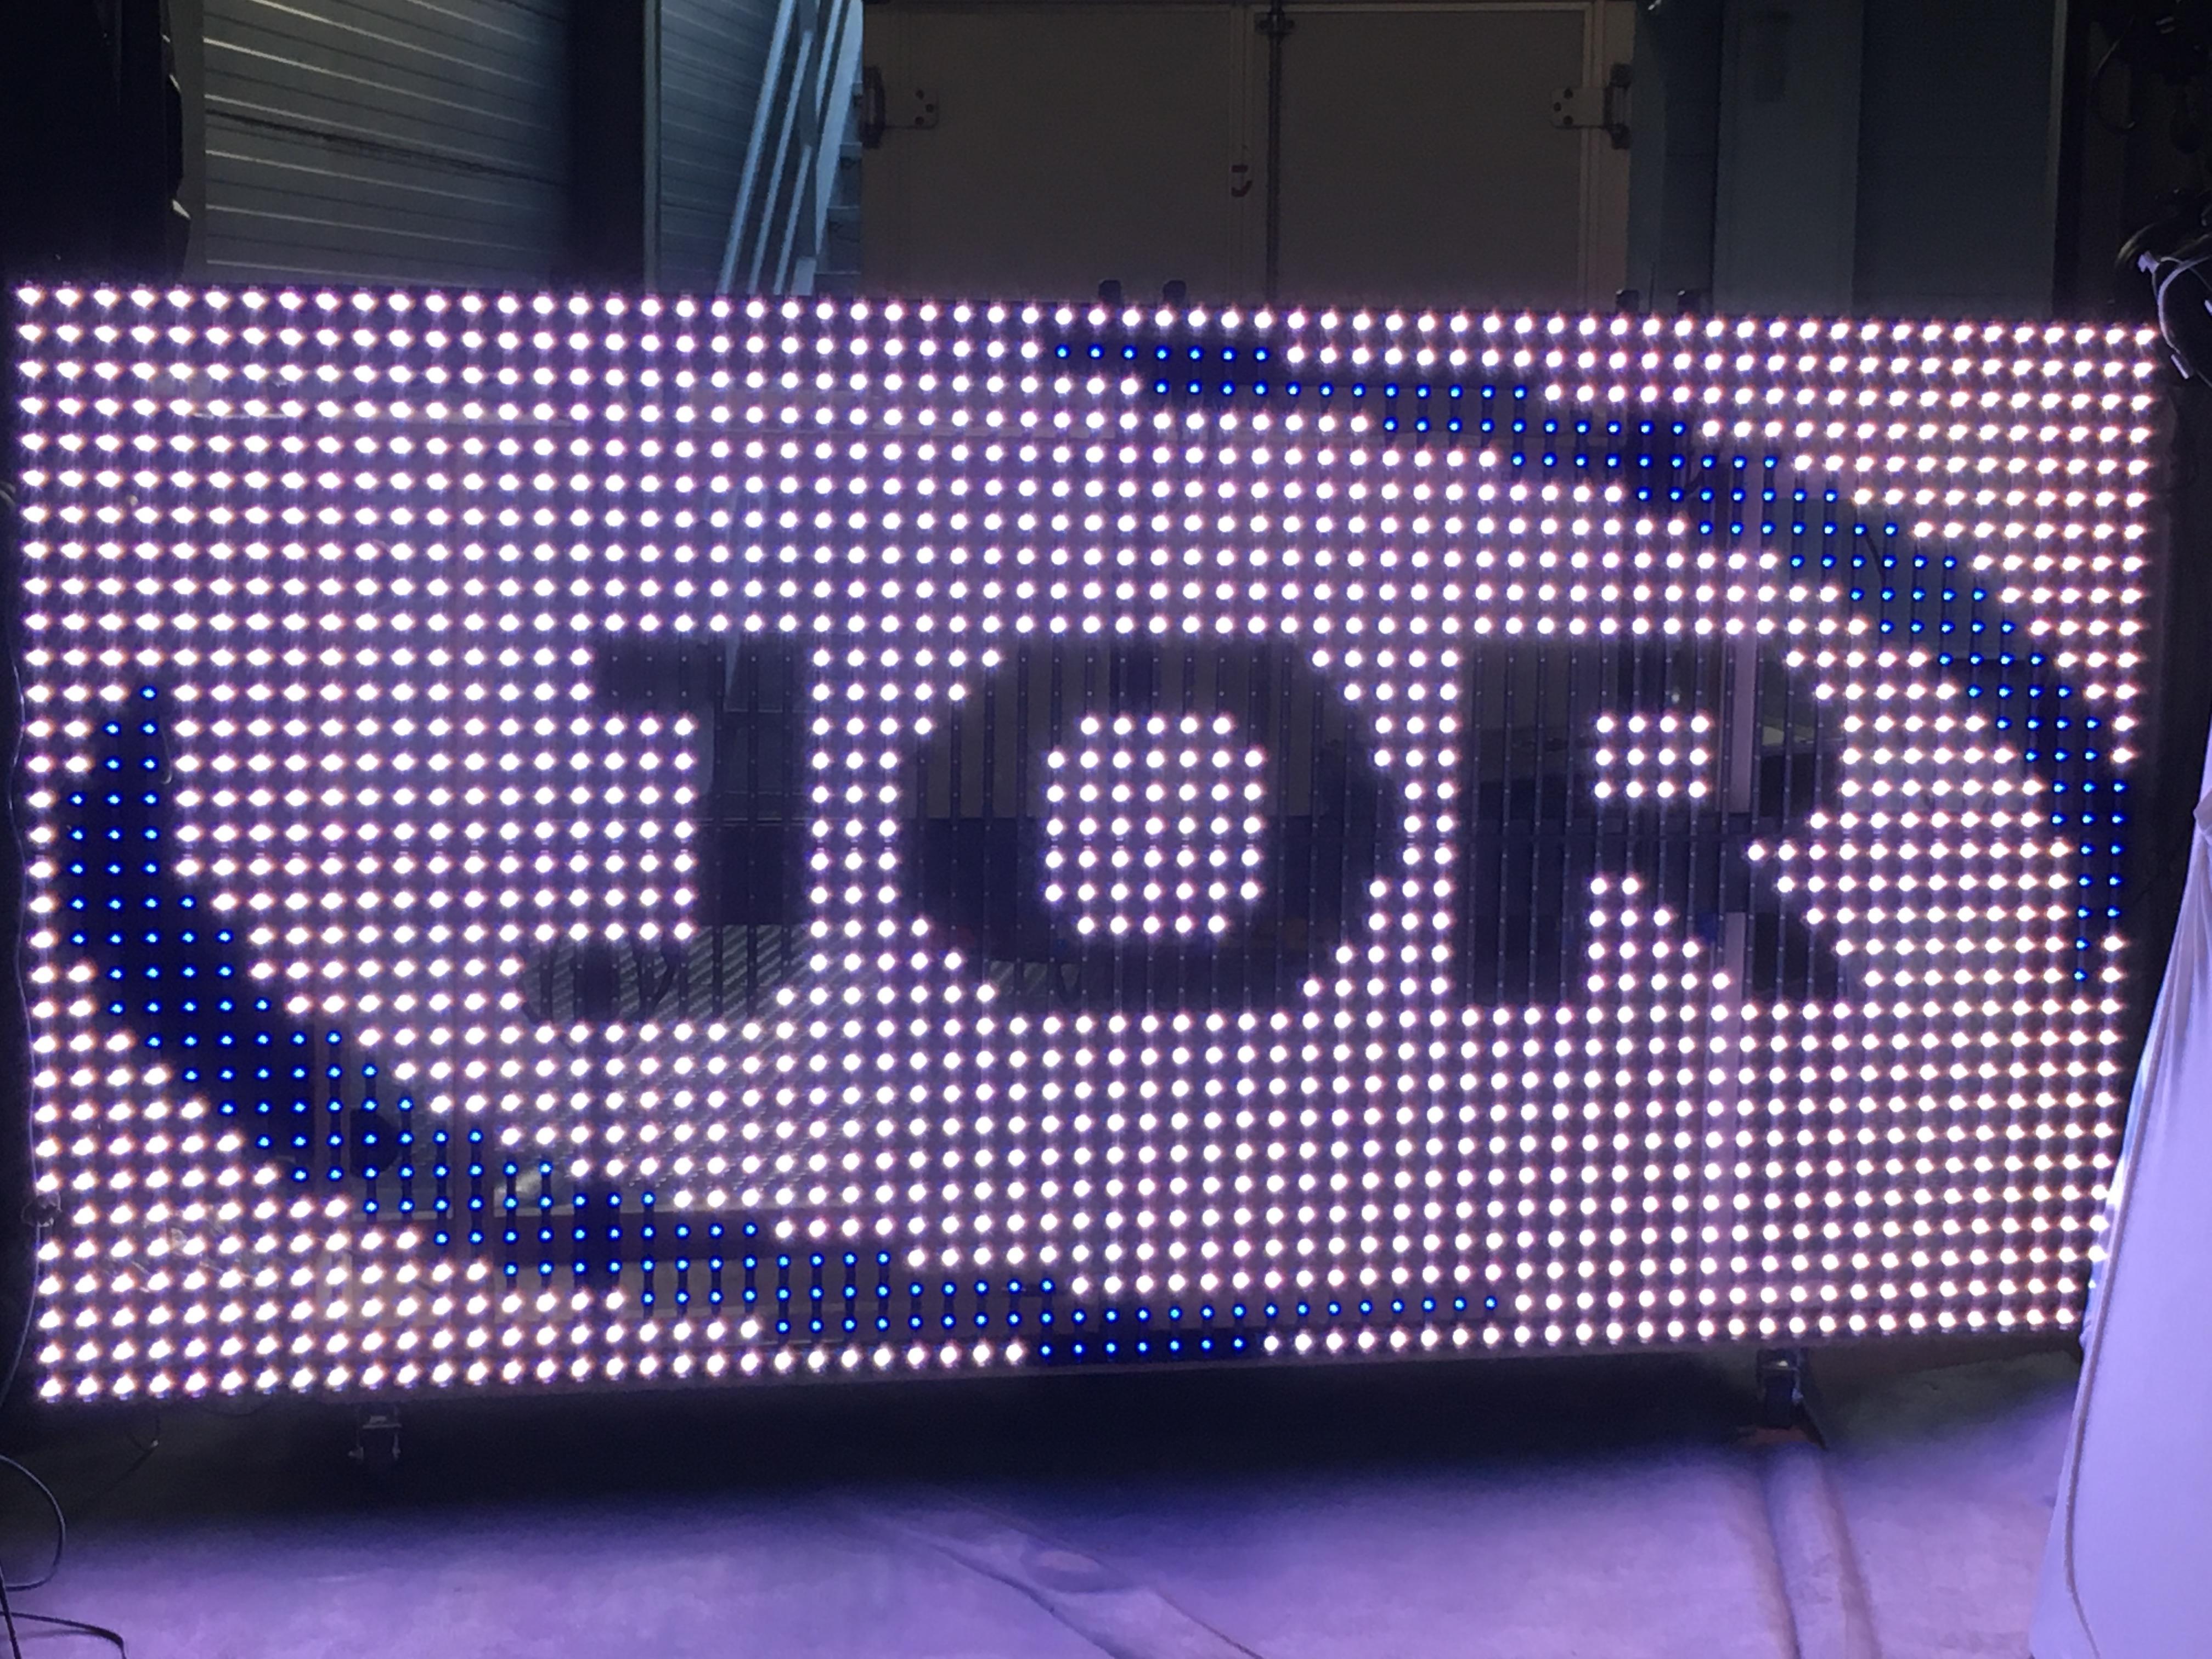 DJ Booth LED pixel